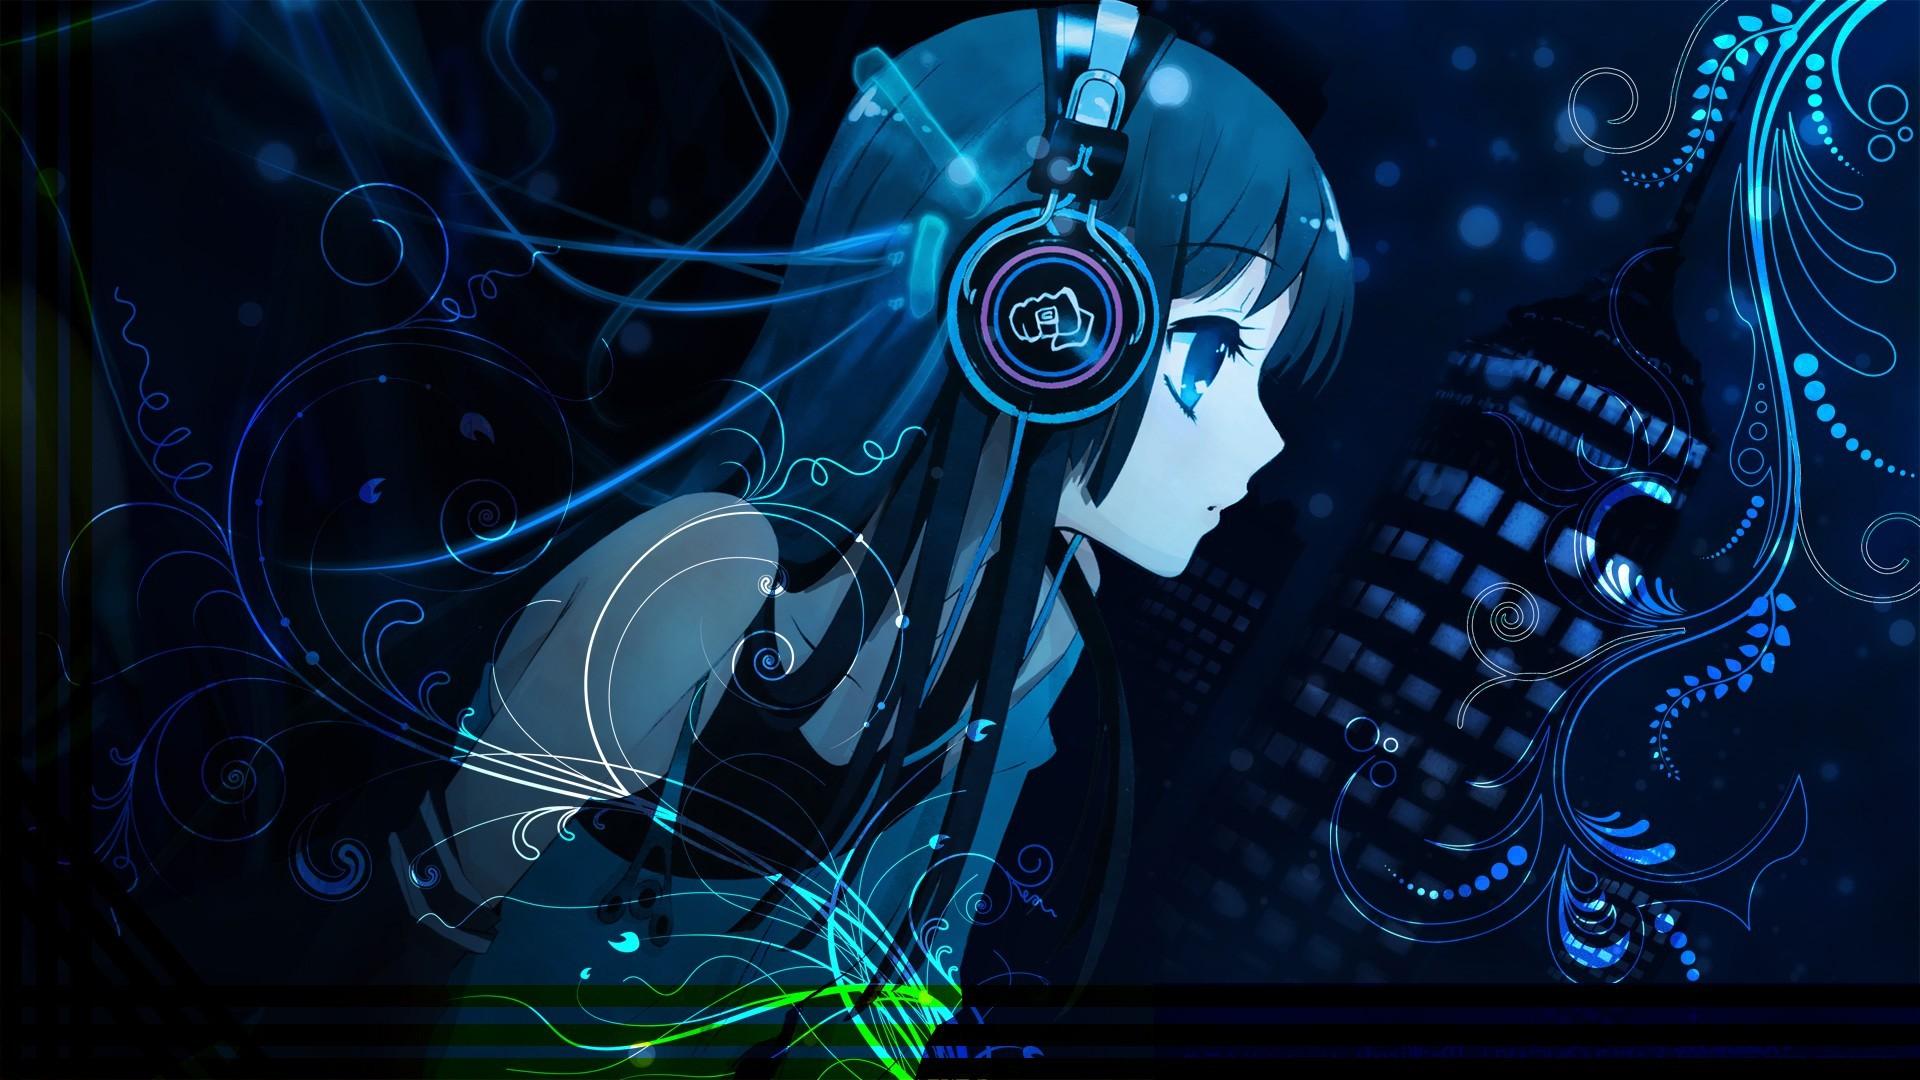 Free Download Anime Music Girl Wallpaper Dreamlovewallpapers